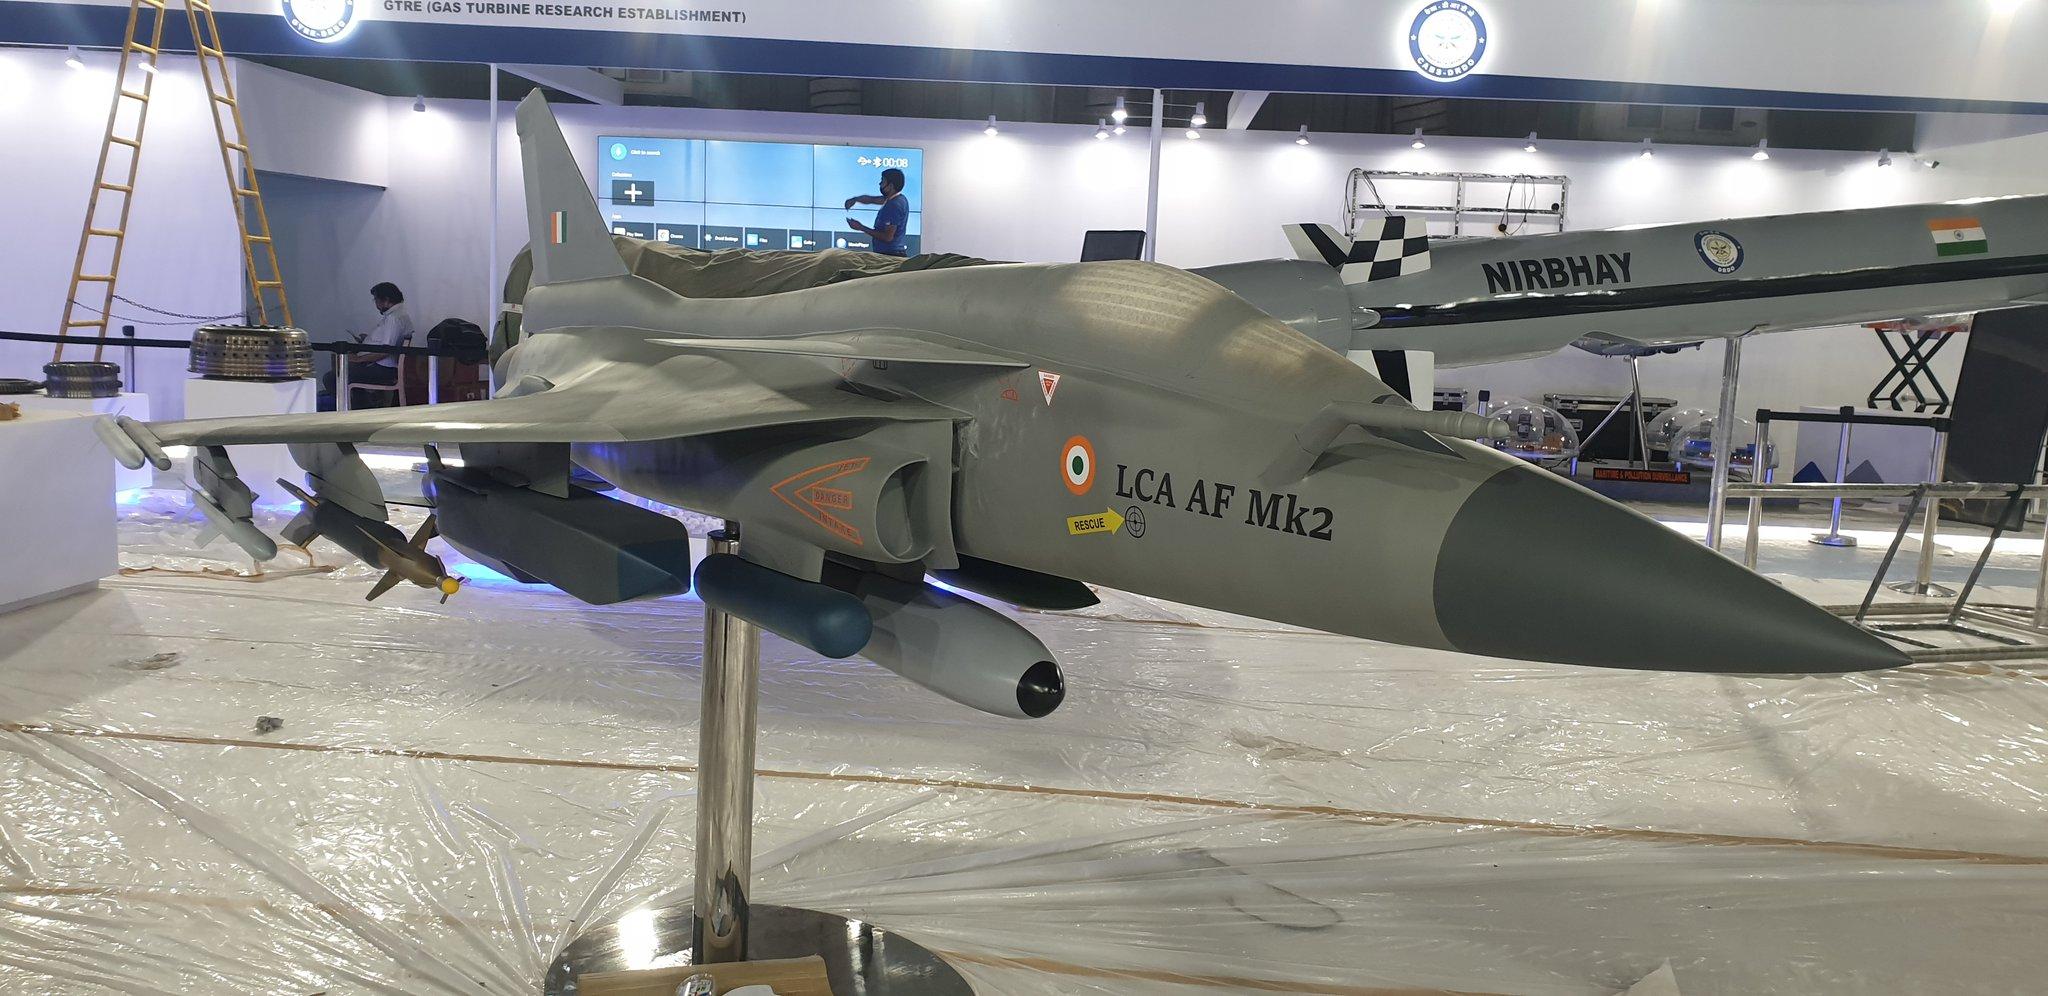 LCA Mk-2